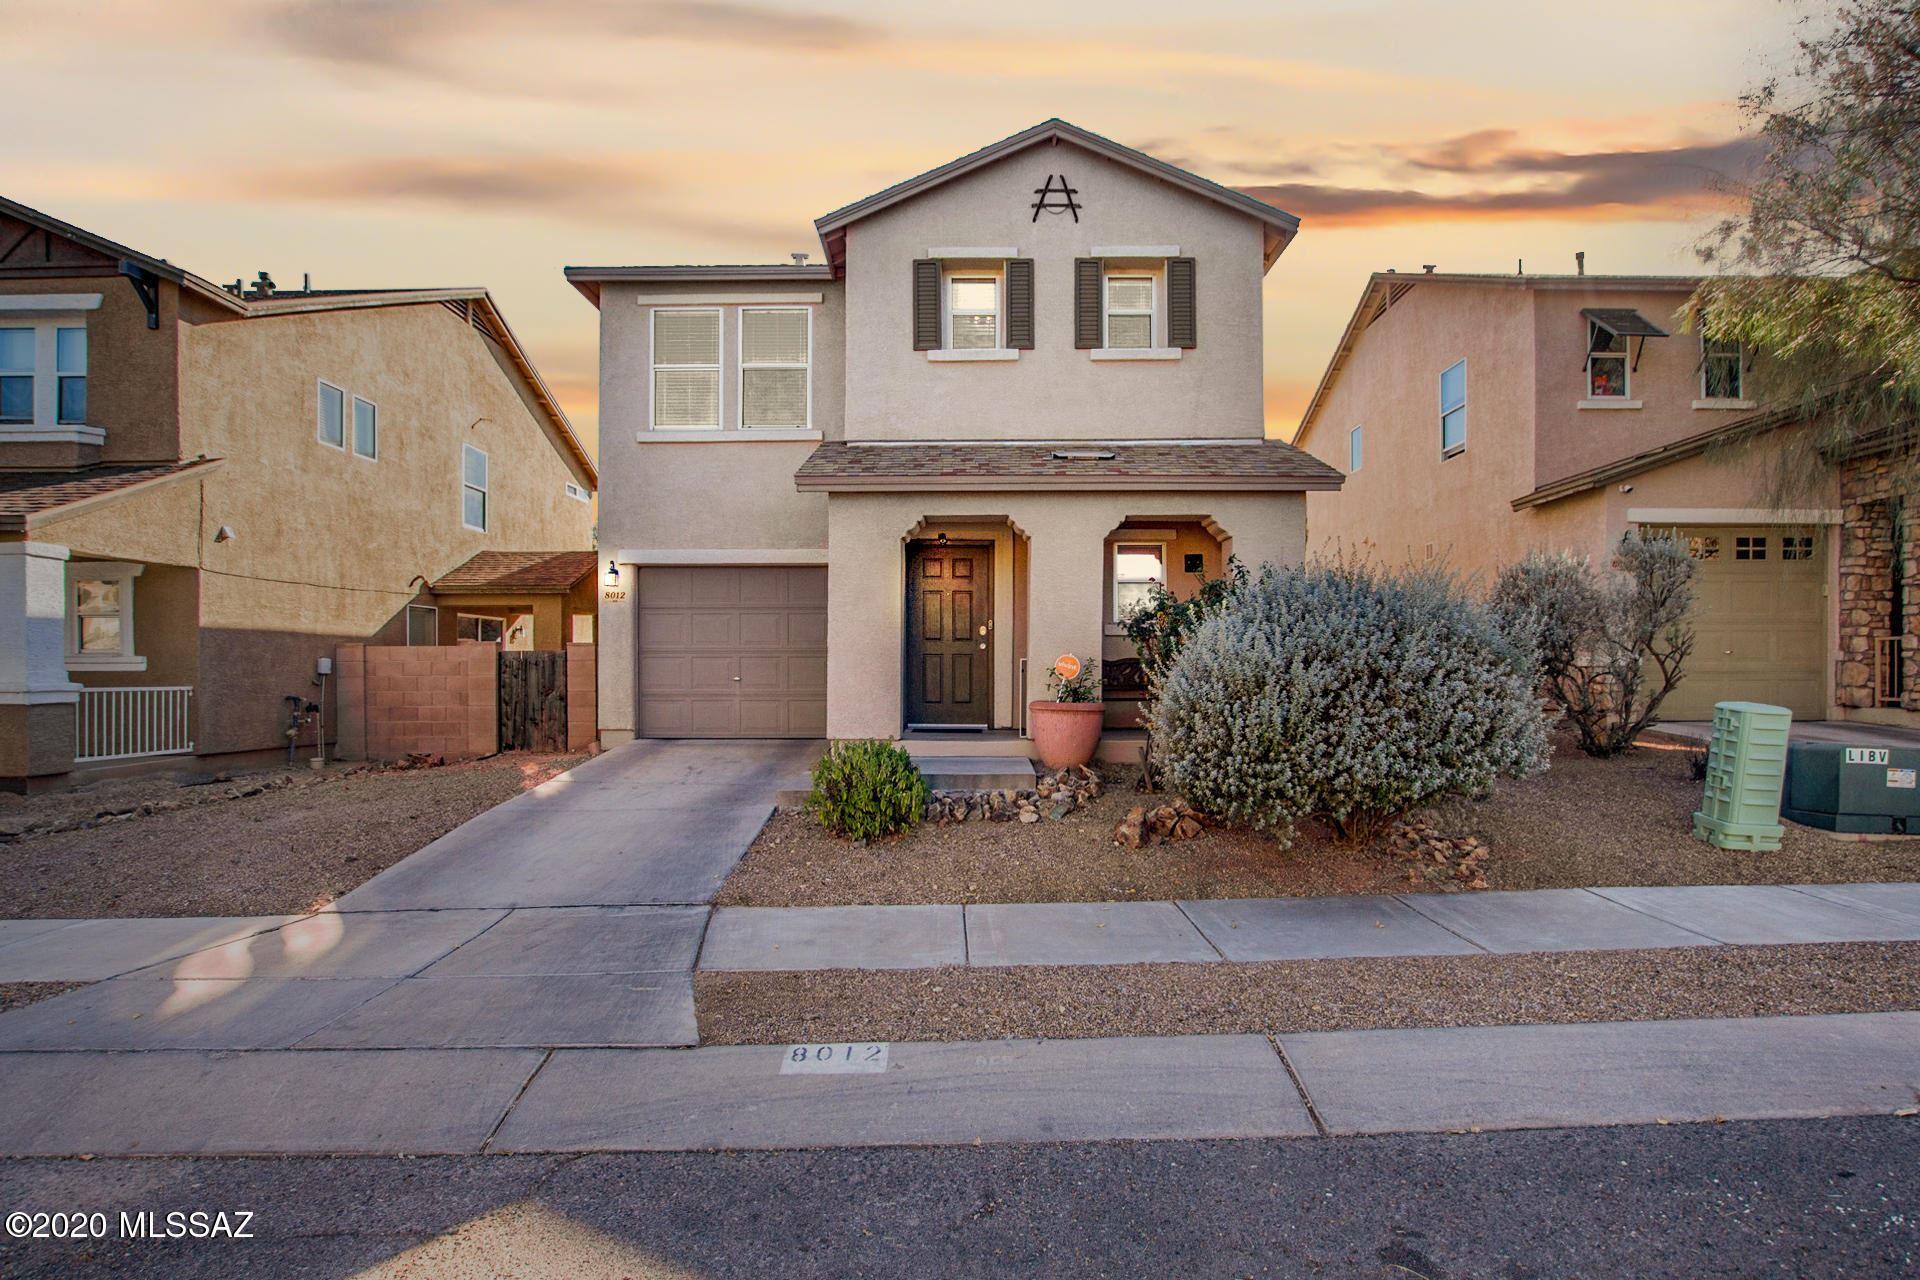 8012 E Senate Street, Tucson, AZ 85730 - MLS#: 22031747